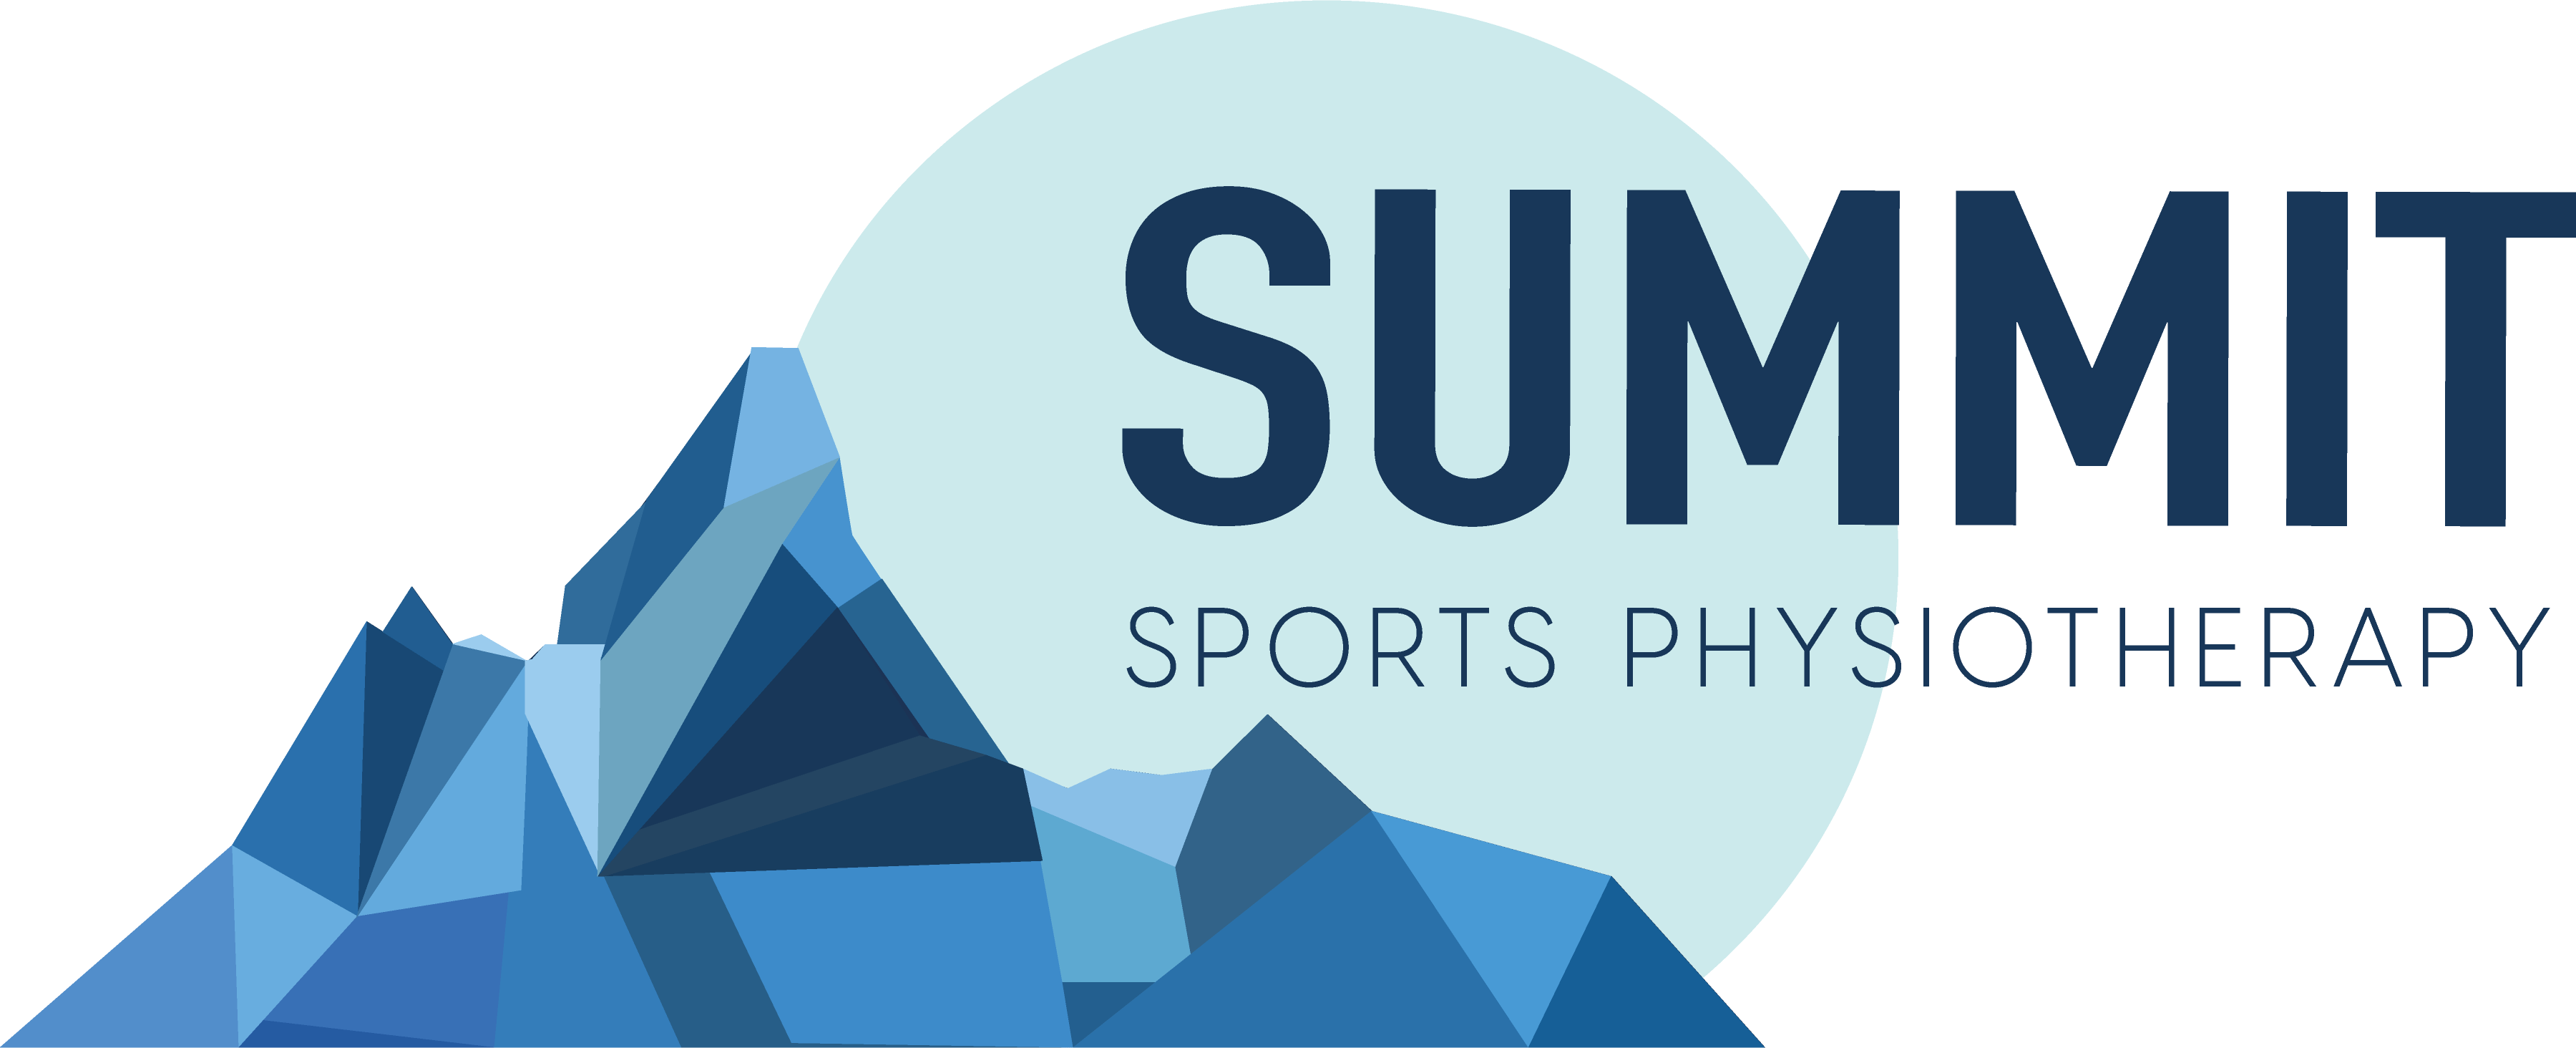 01 summit logo full color rgb 1